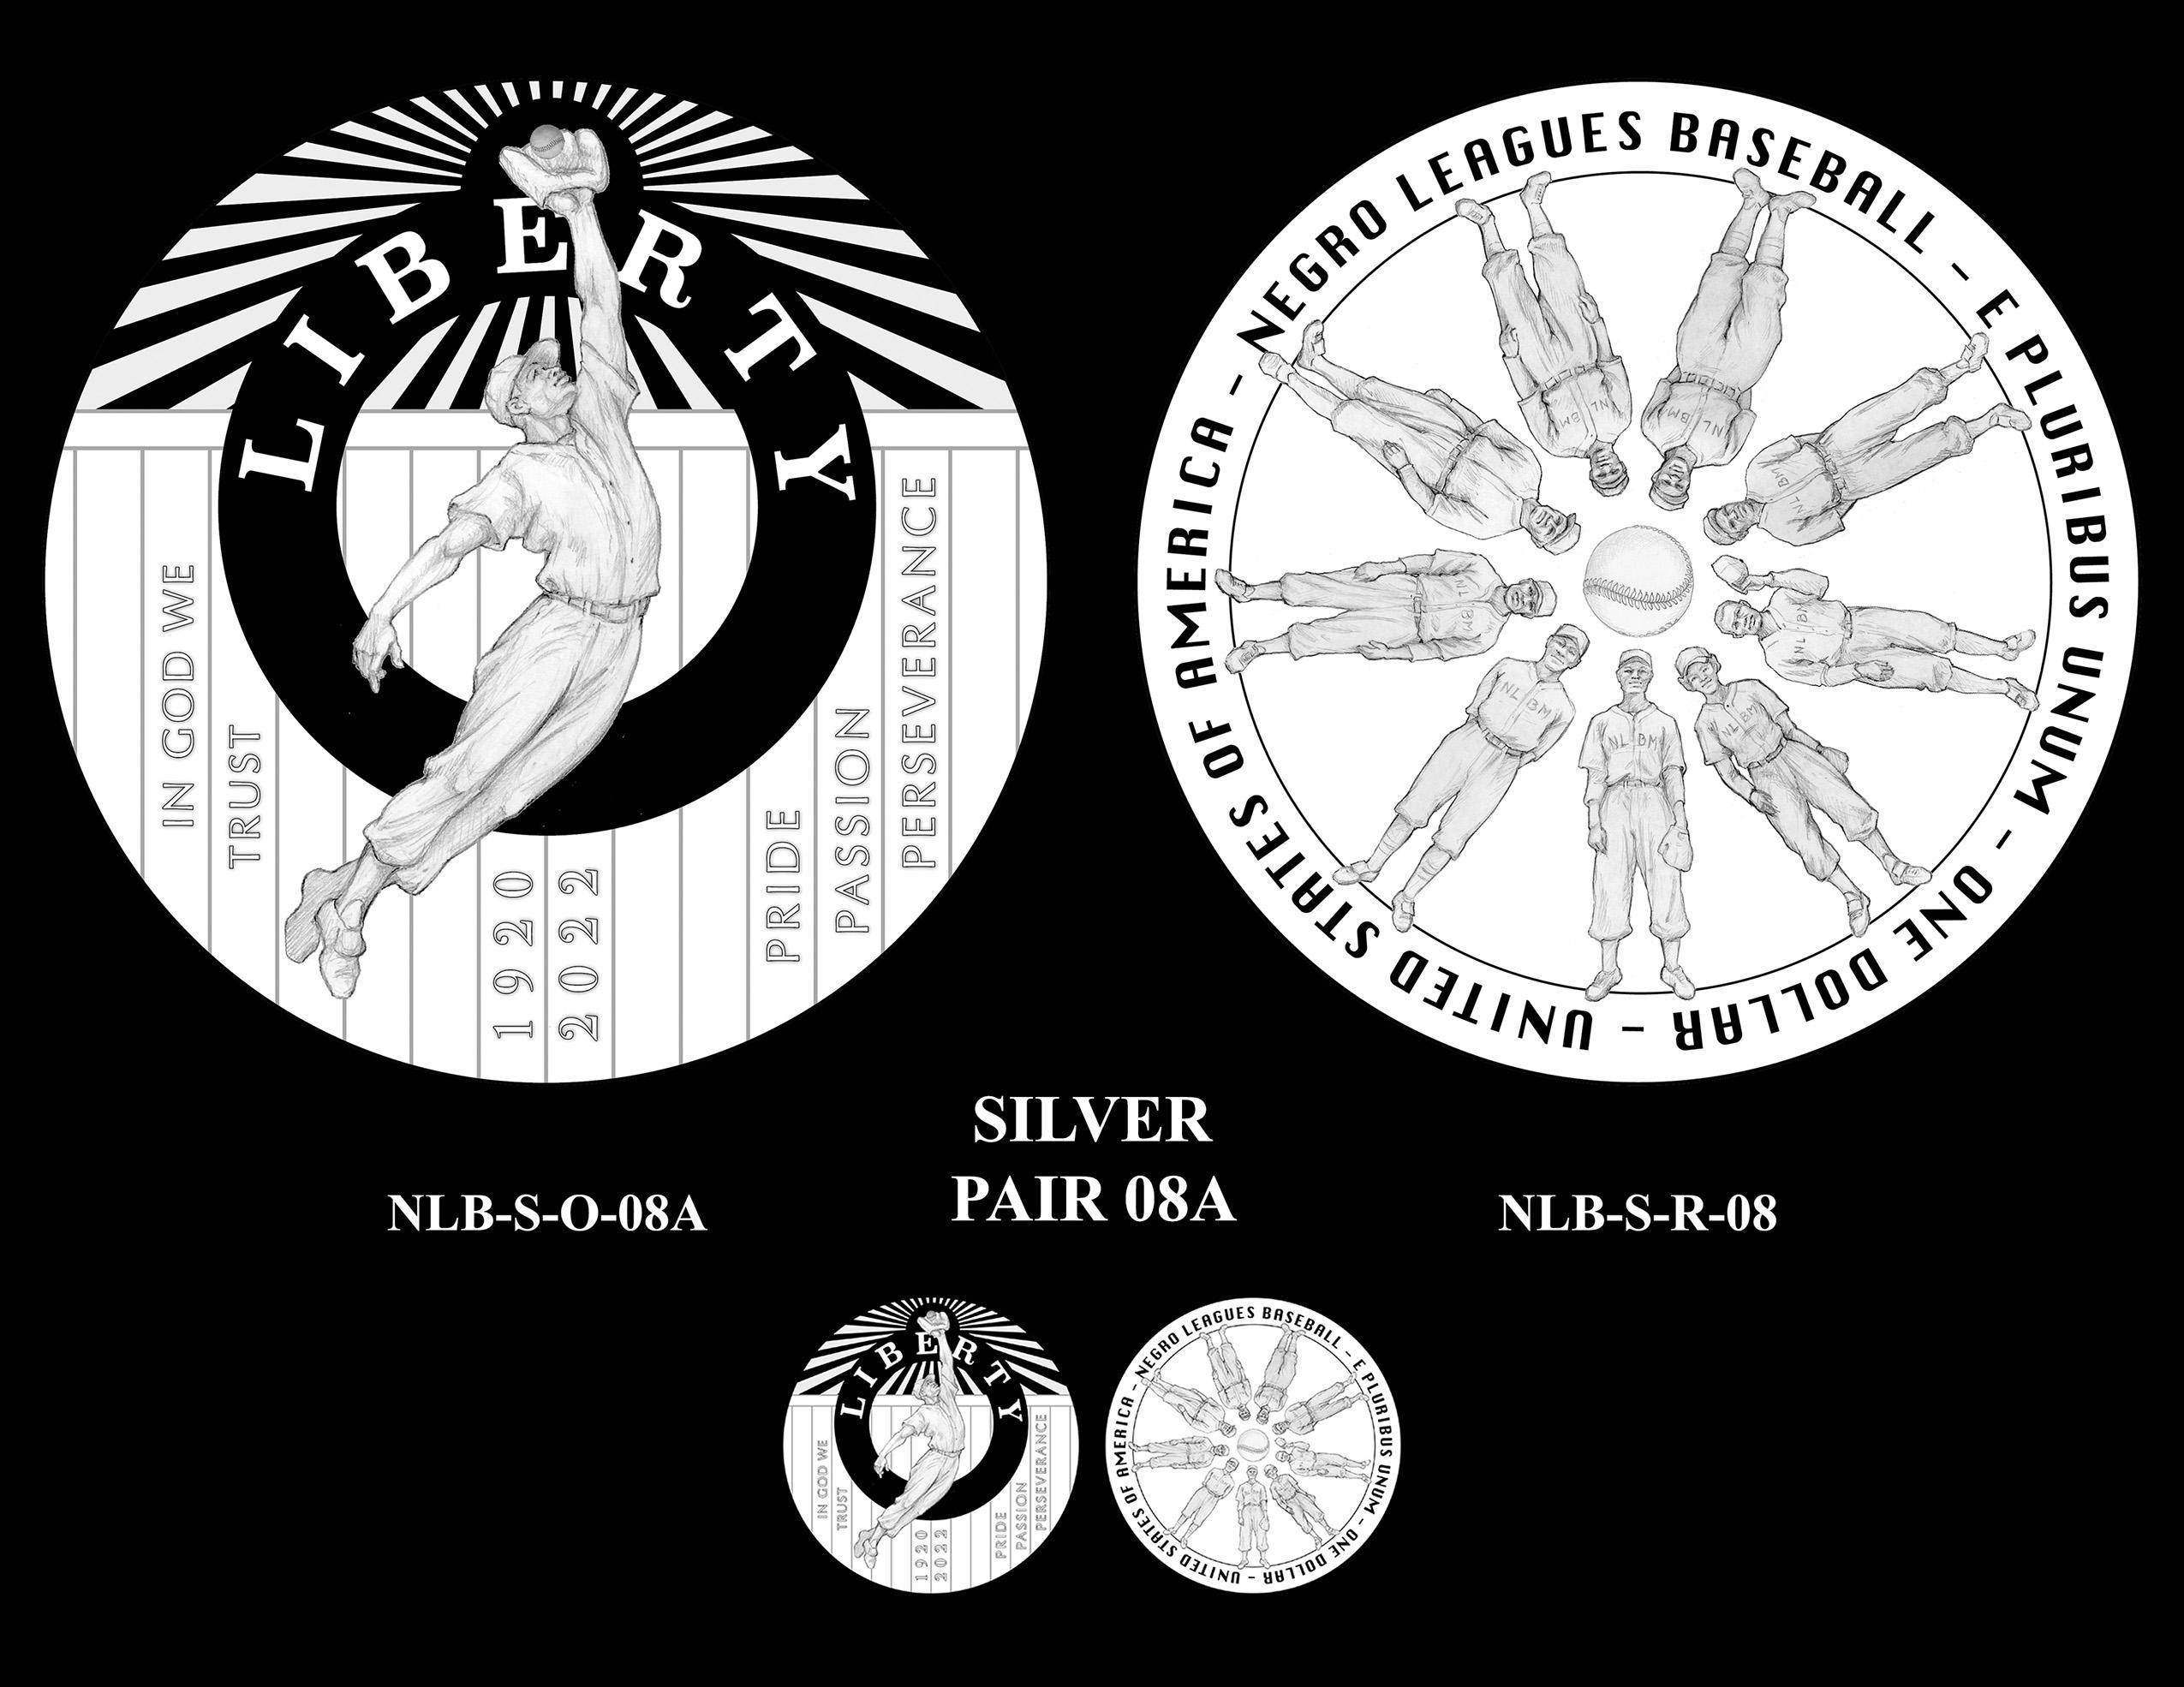 Silver Pair 08A -- Negro Leagues Baseball Commemorative Coin Program